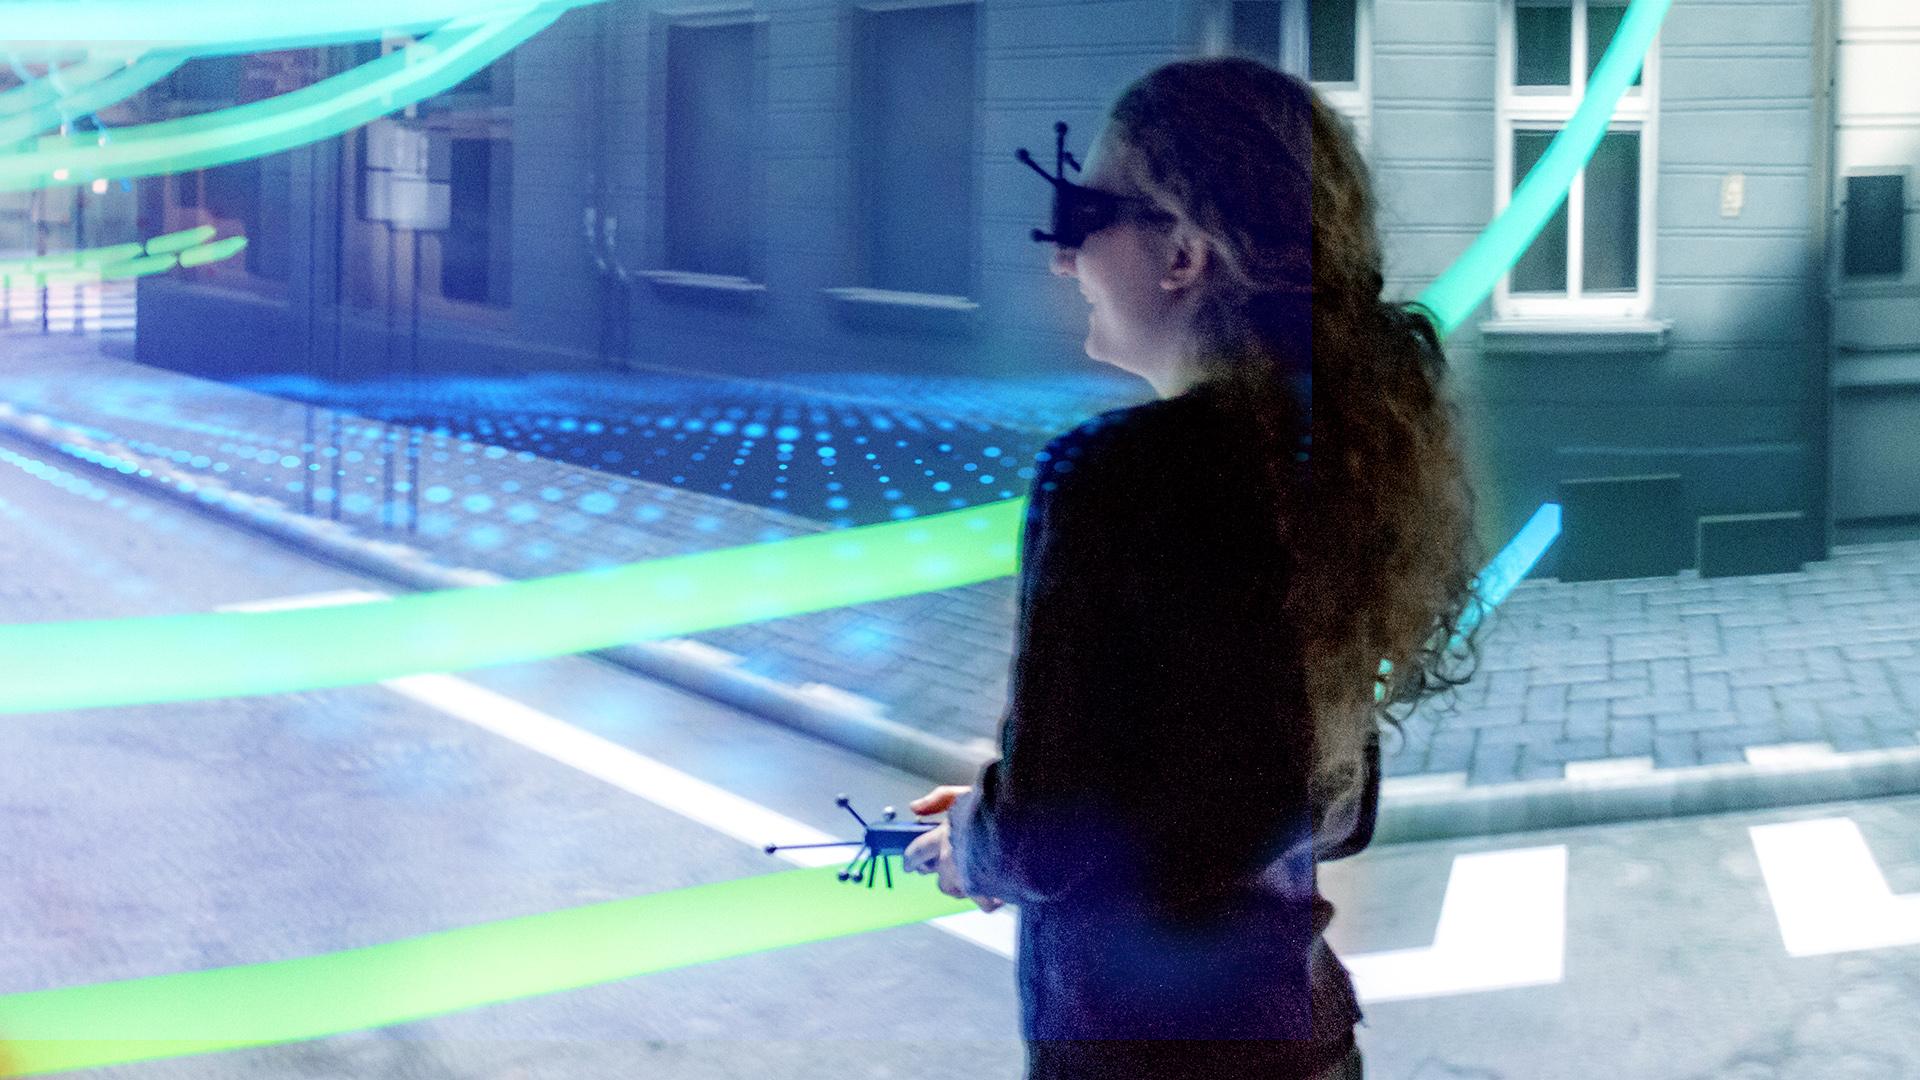 Wizualizacja, imersja i interakcja (VR, AR)